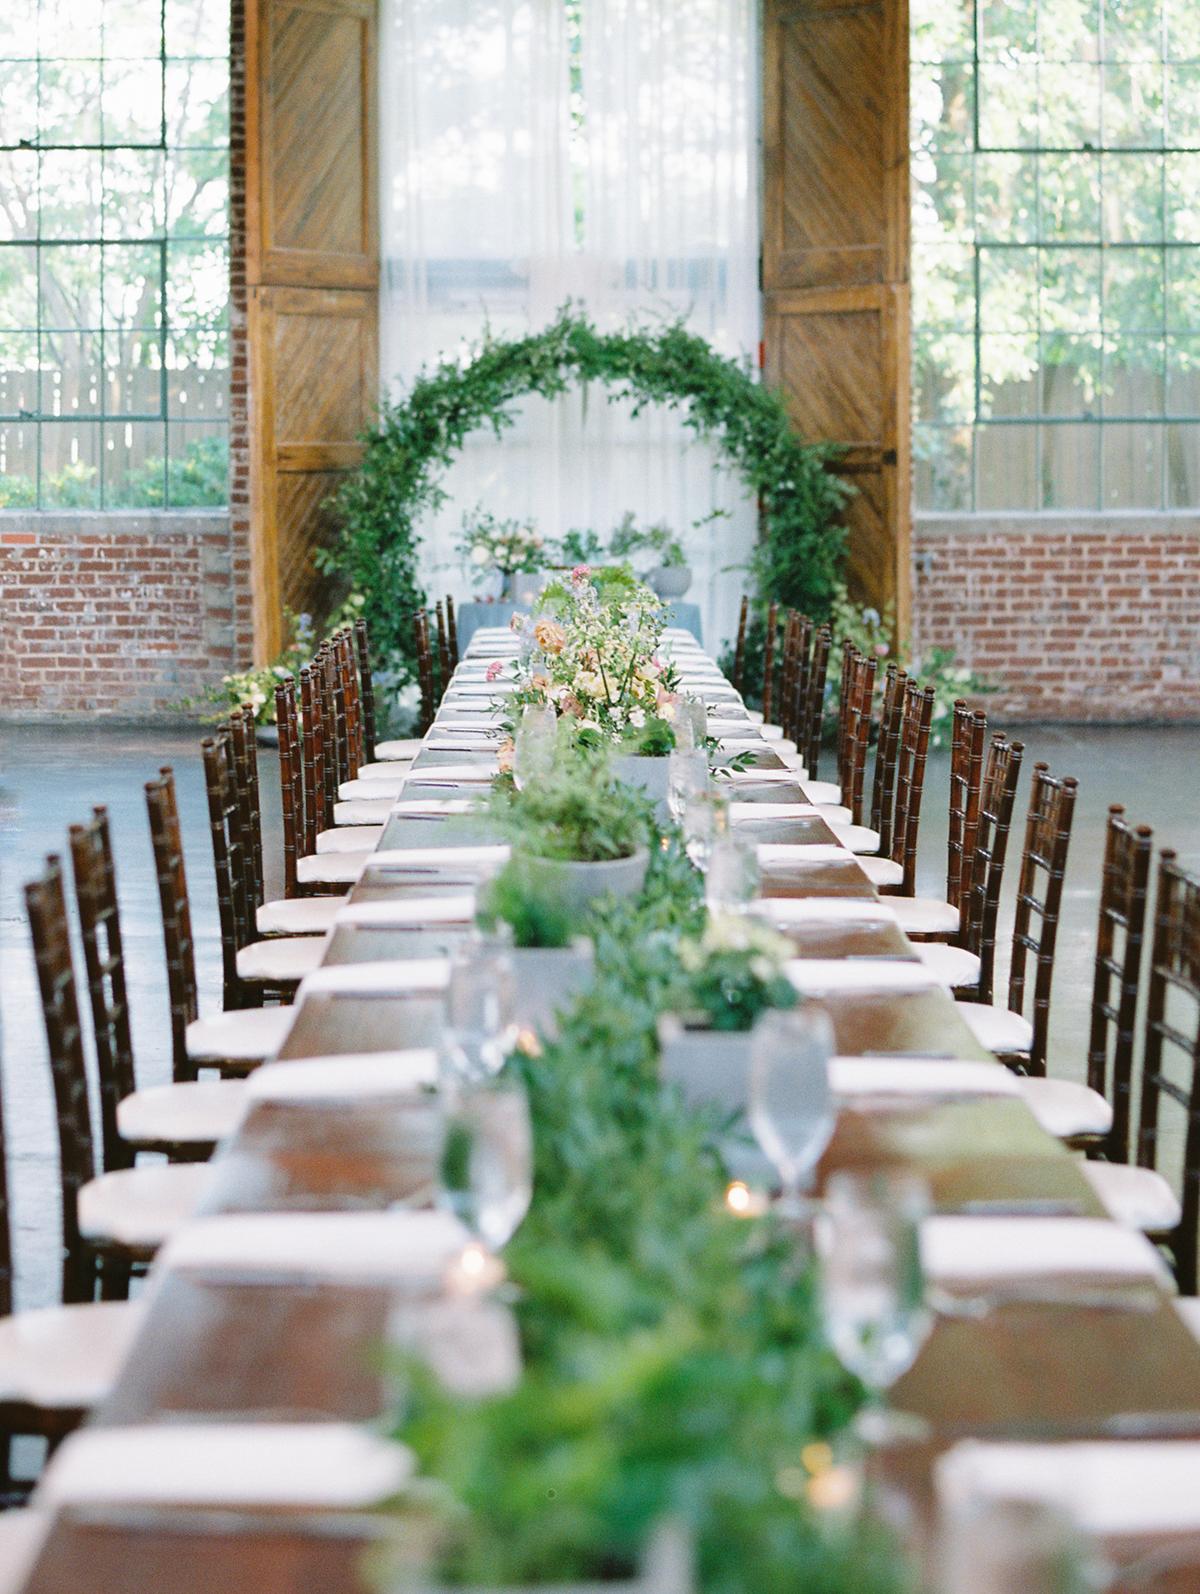 Foundry-At-Puritan-Mill-wedding-photos-venue-atlanta-fine-art-film-photographer51.JPG